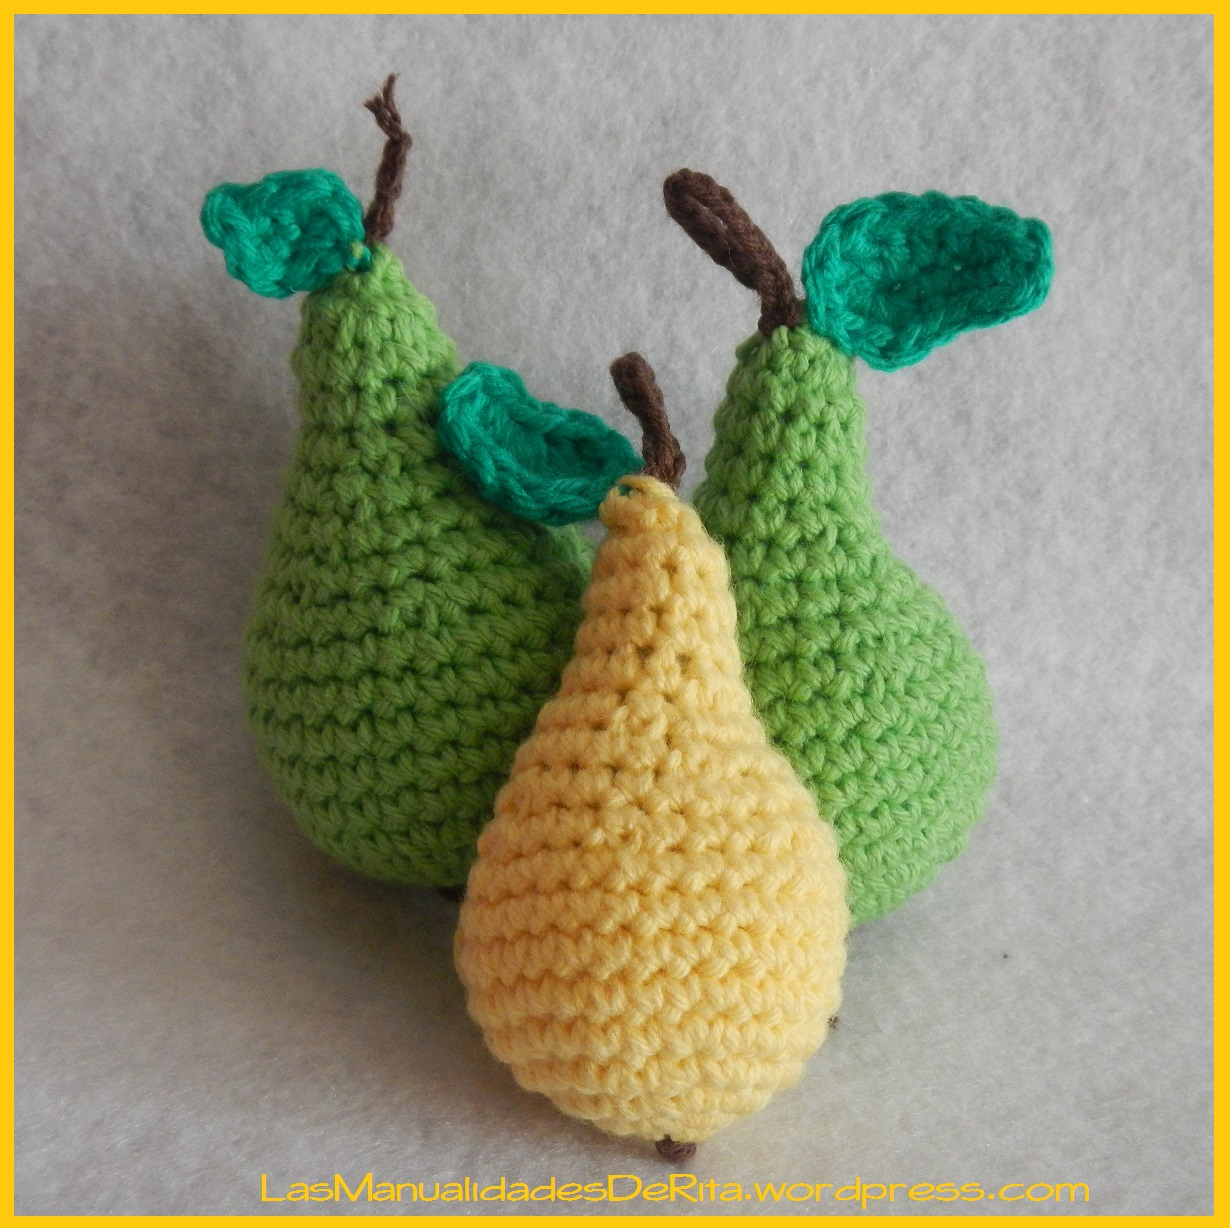 10 ideas de frutas crochet - ganchillo | Crochet food, Crochet ... | 1228x1230